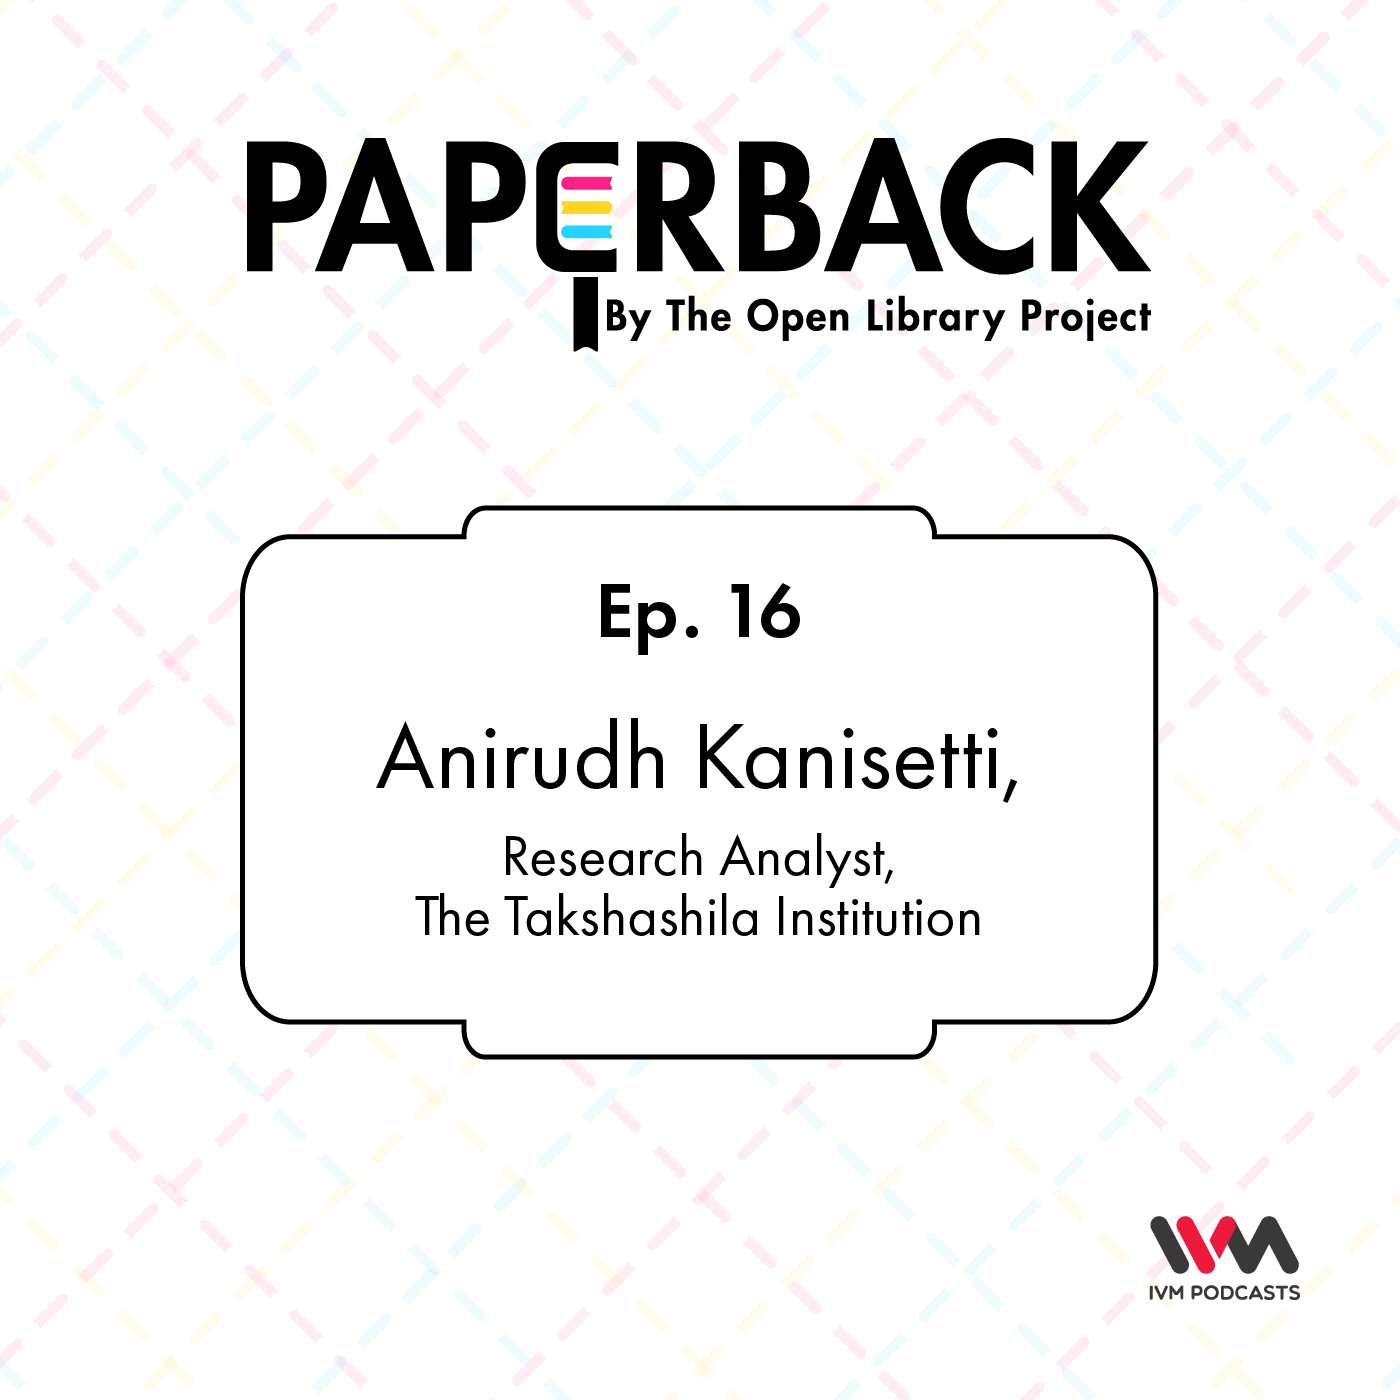 Ep. 16: Anirudh Kanisetti